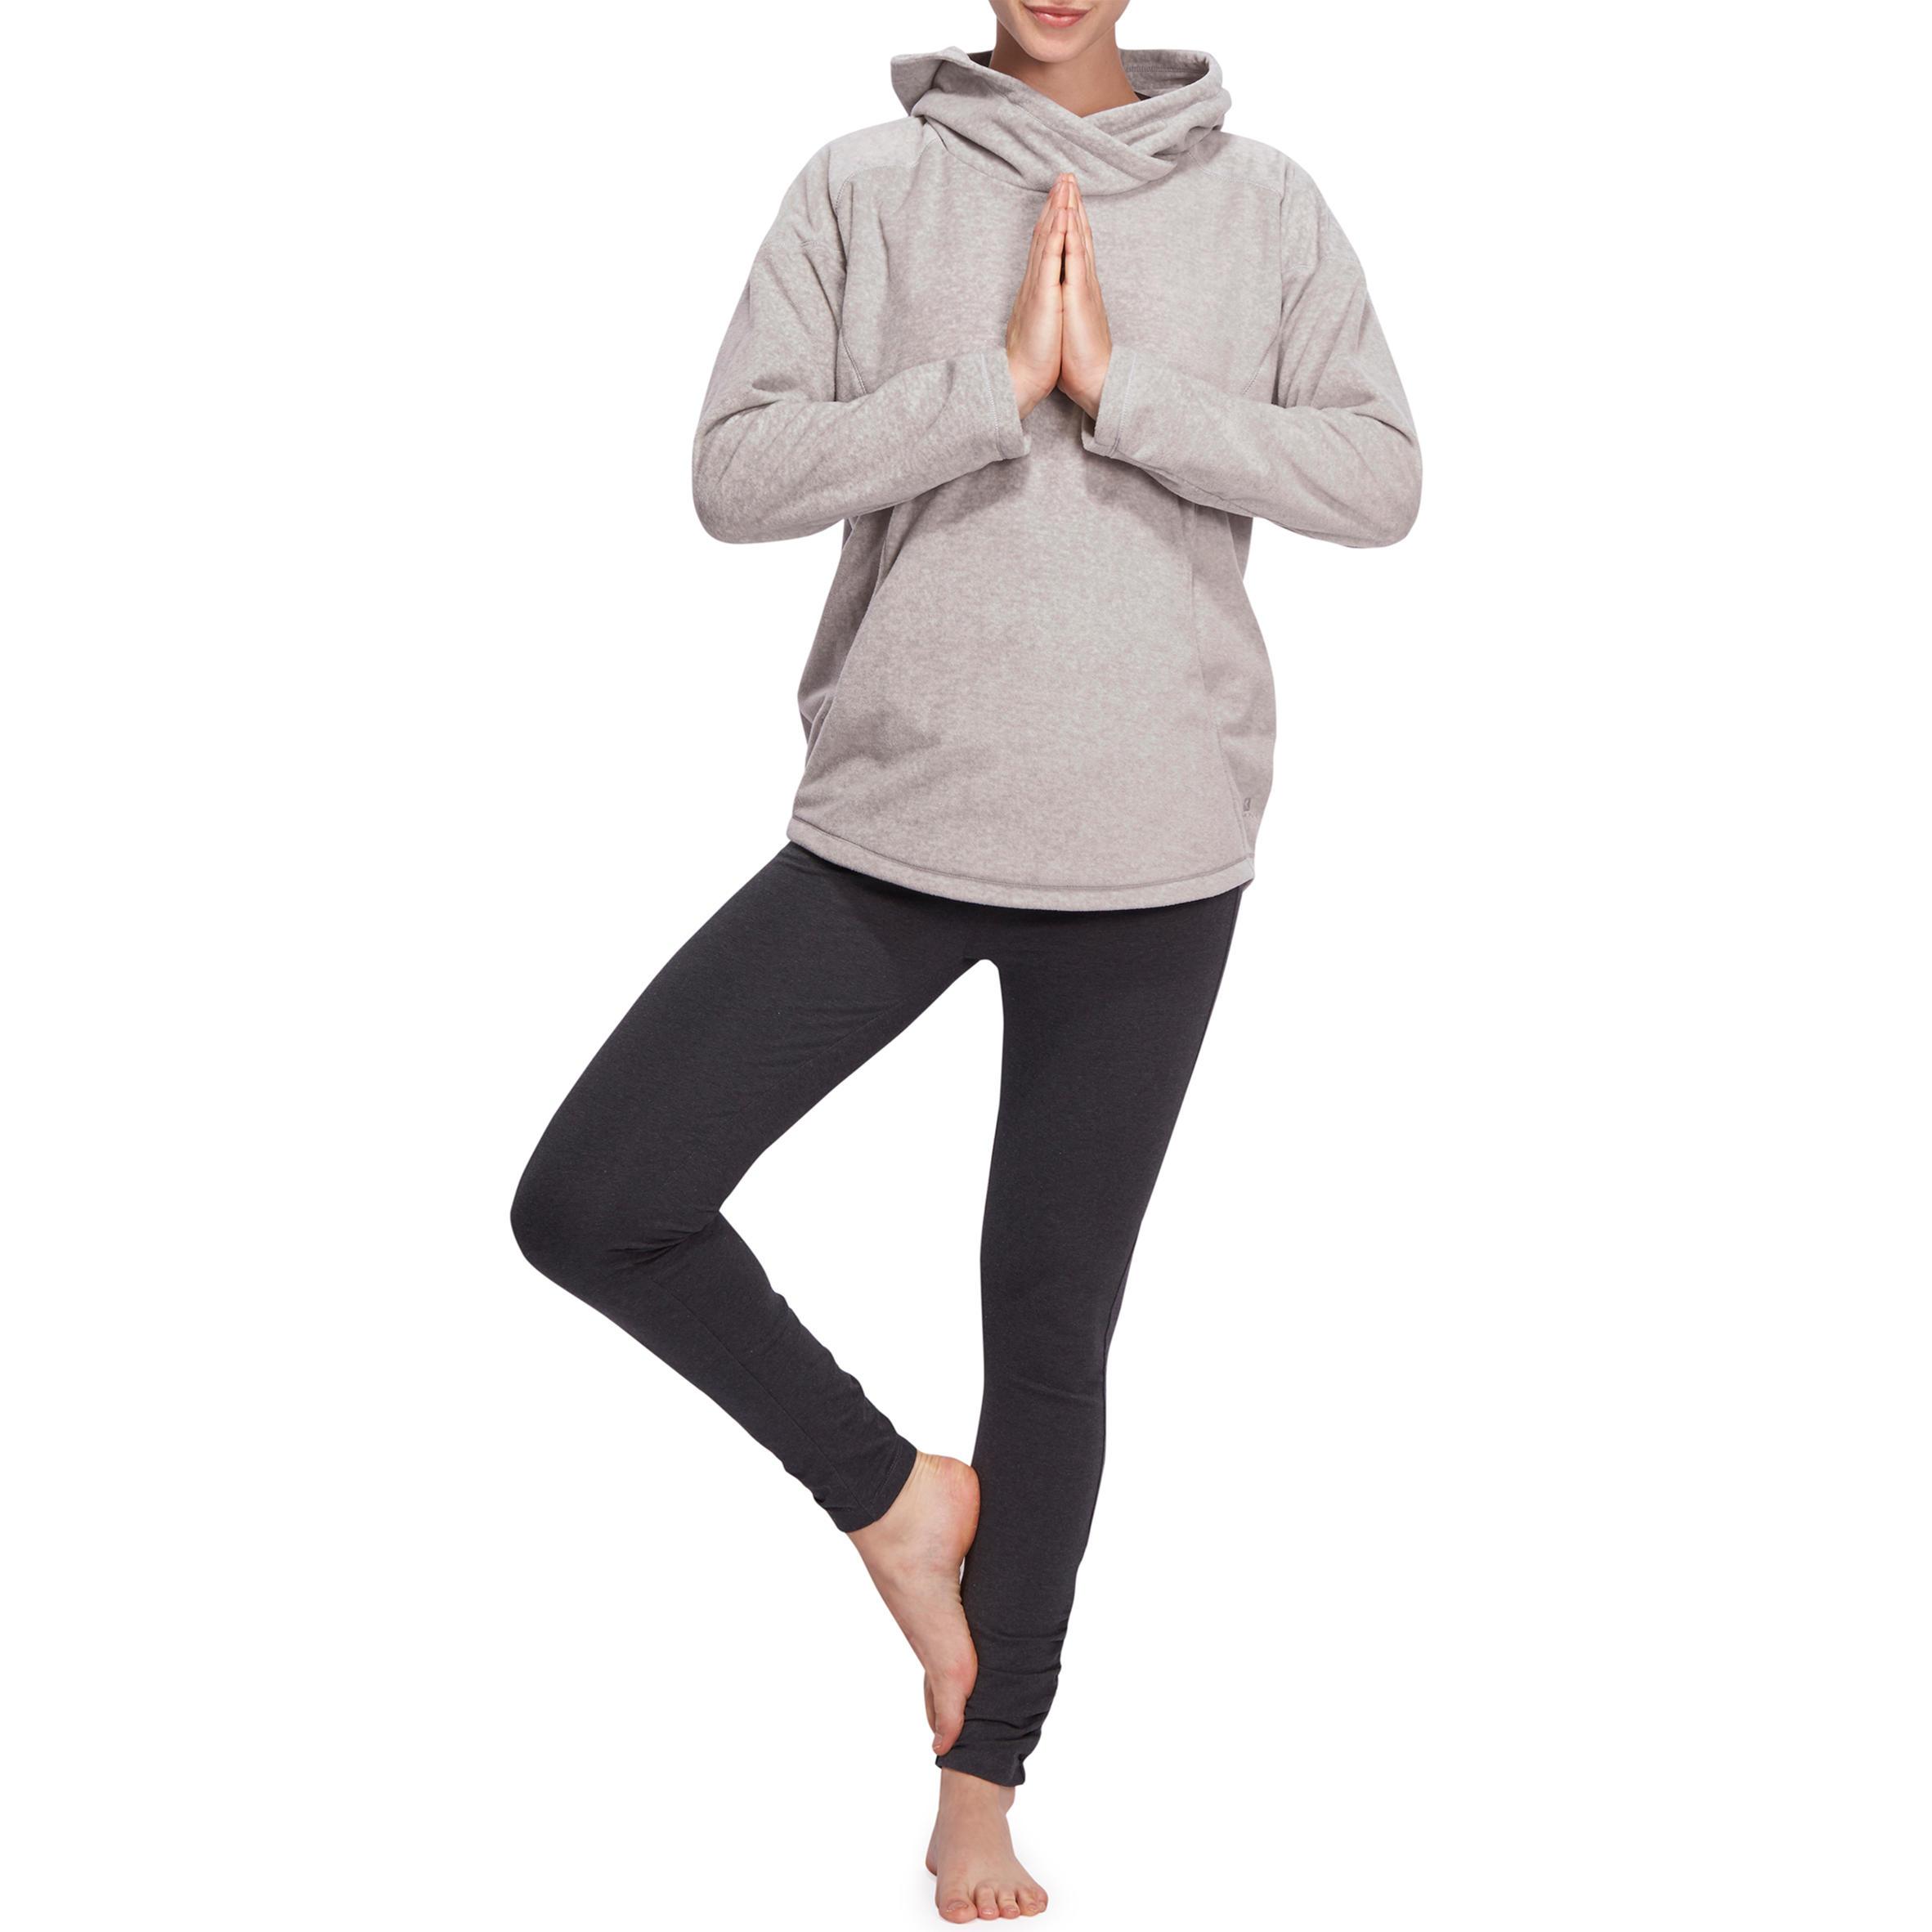 Boutique en ligne b51d4 fdcd6 Sudadera polar relajación yoga mujer gris